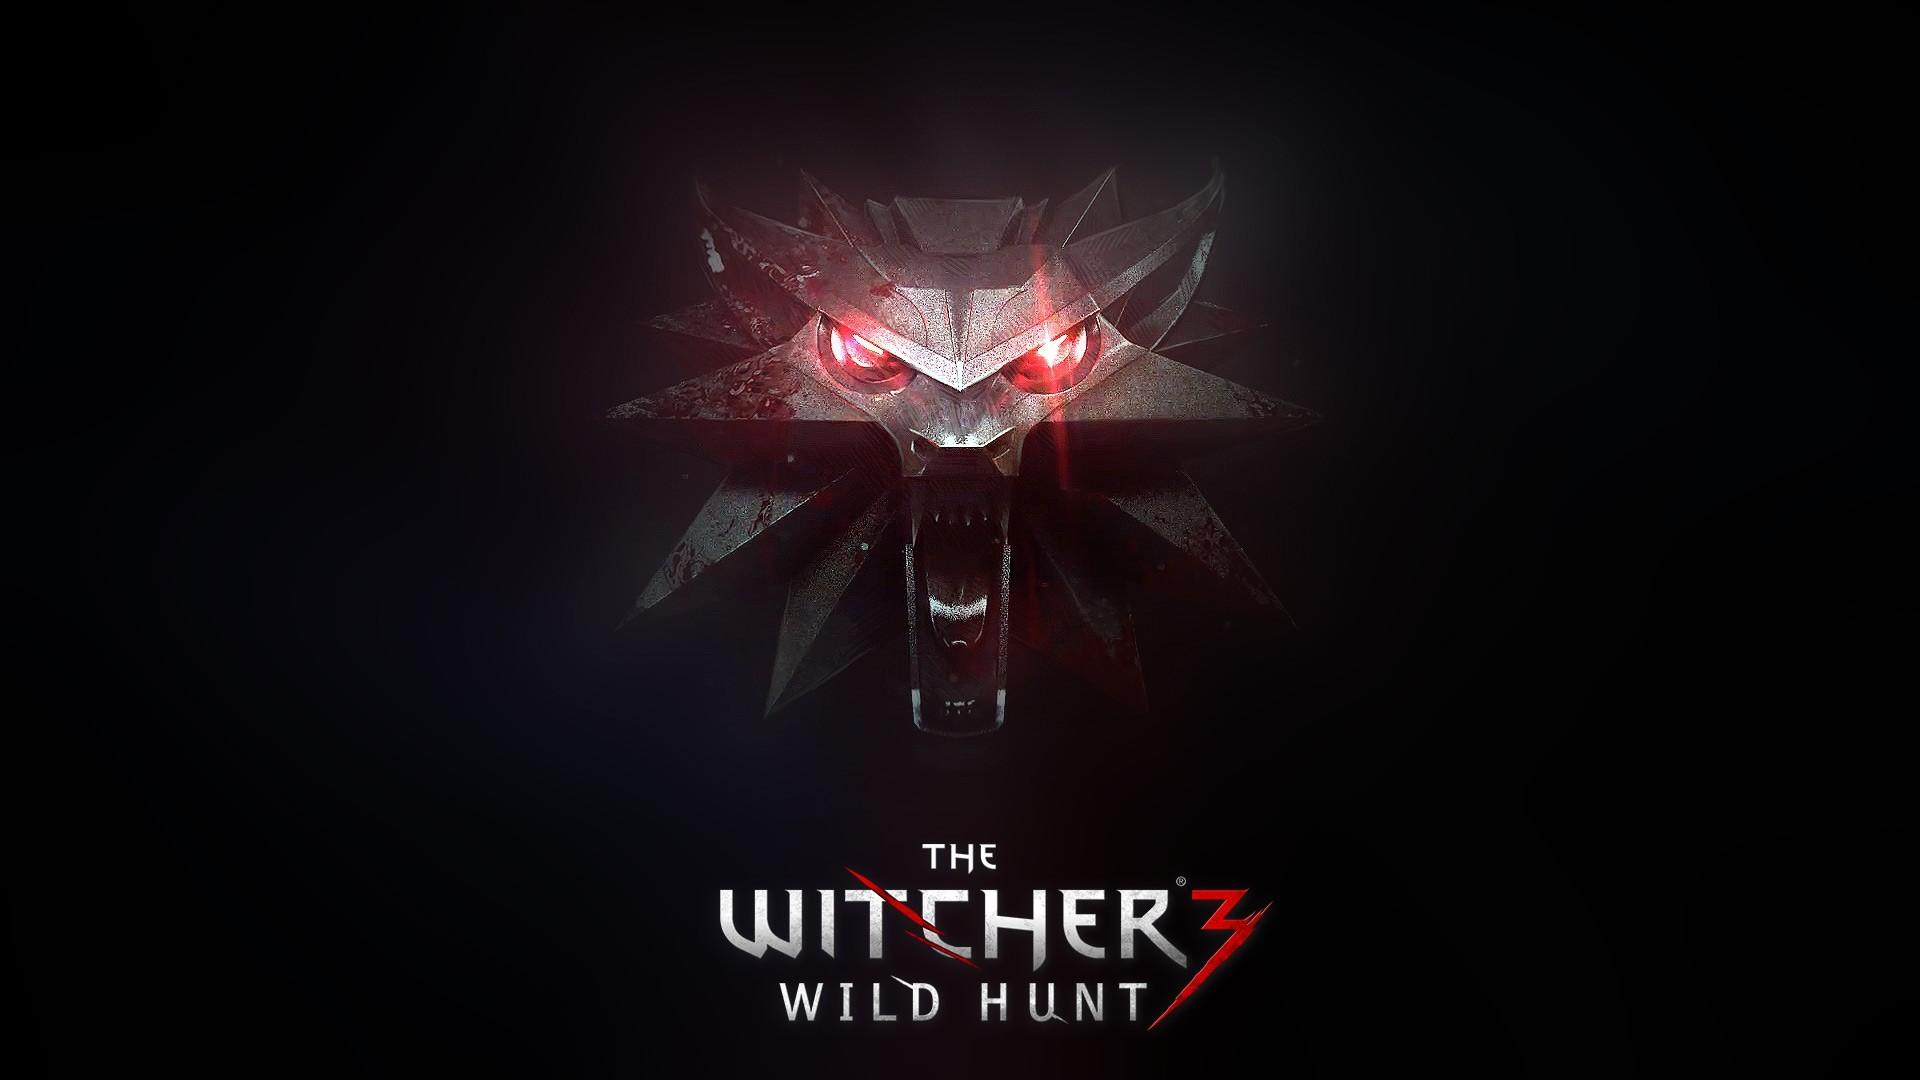 rpg-medallion-the-witcher-3-wild-hunt-1920x1080-wallpaper.jpg